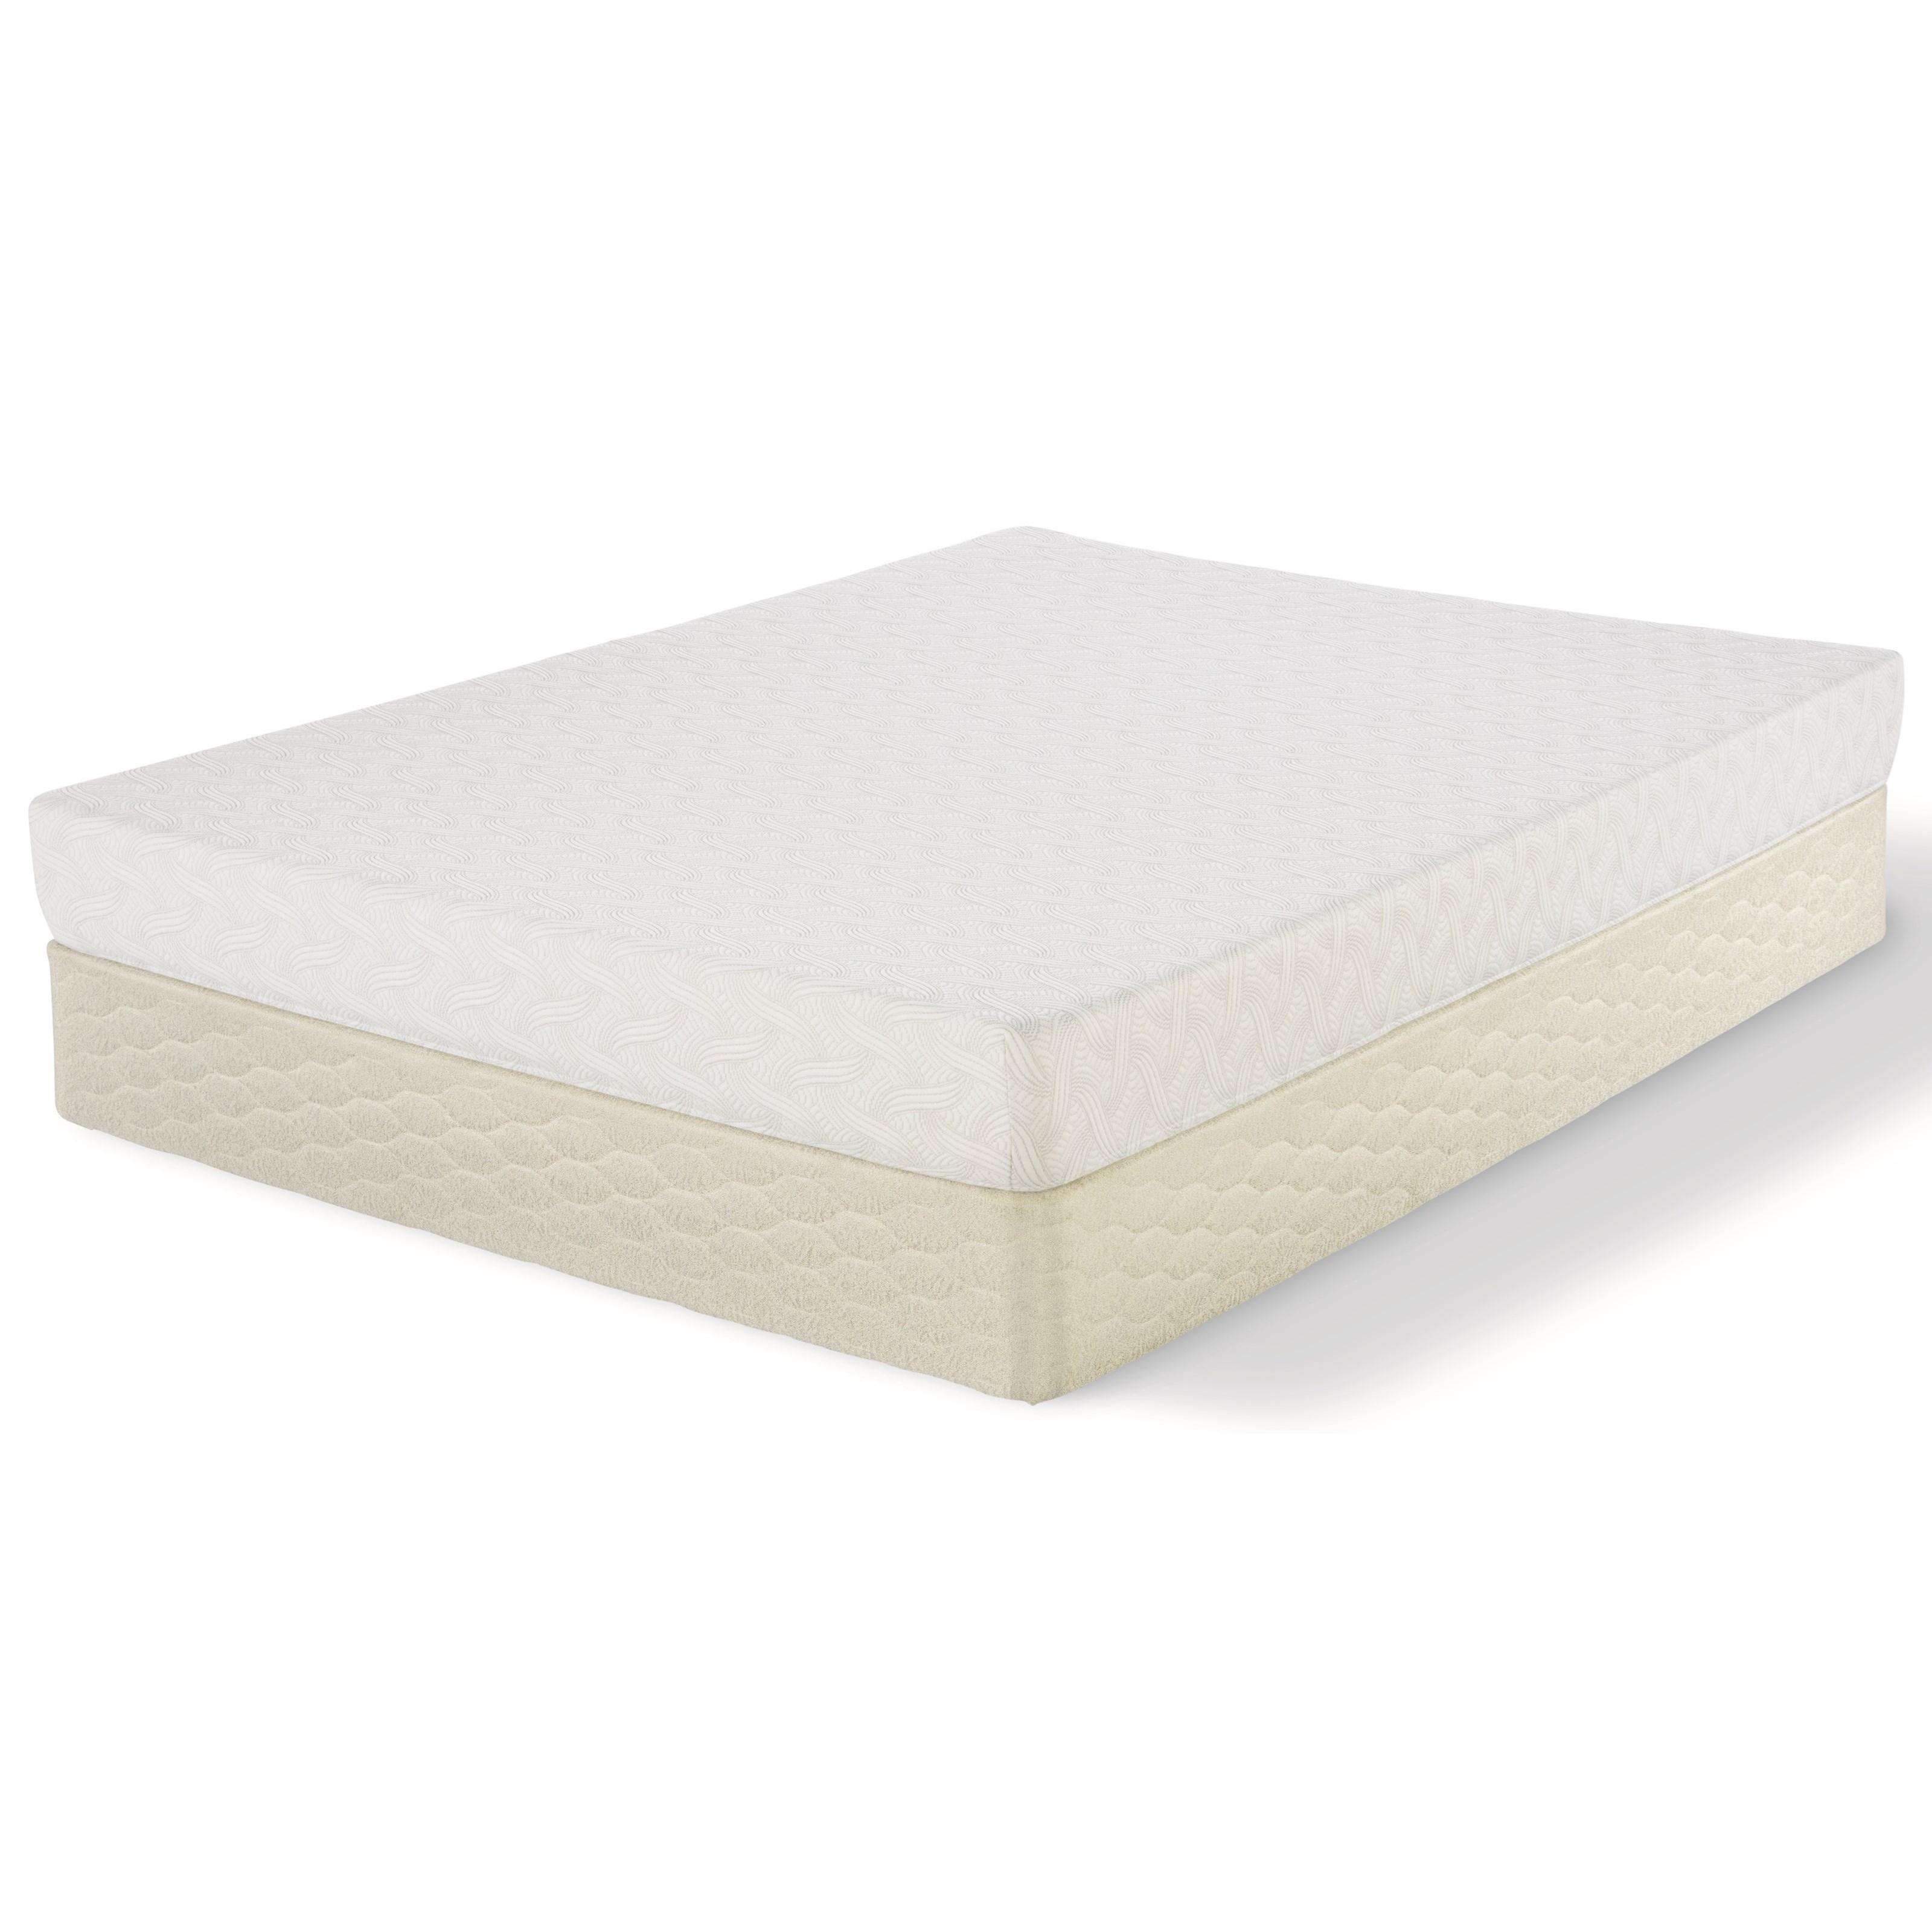 "Serta Feilding Full 7"" Memory Foam Mattress Set - Item Number: 500573287-1030+500117399-6030"